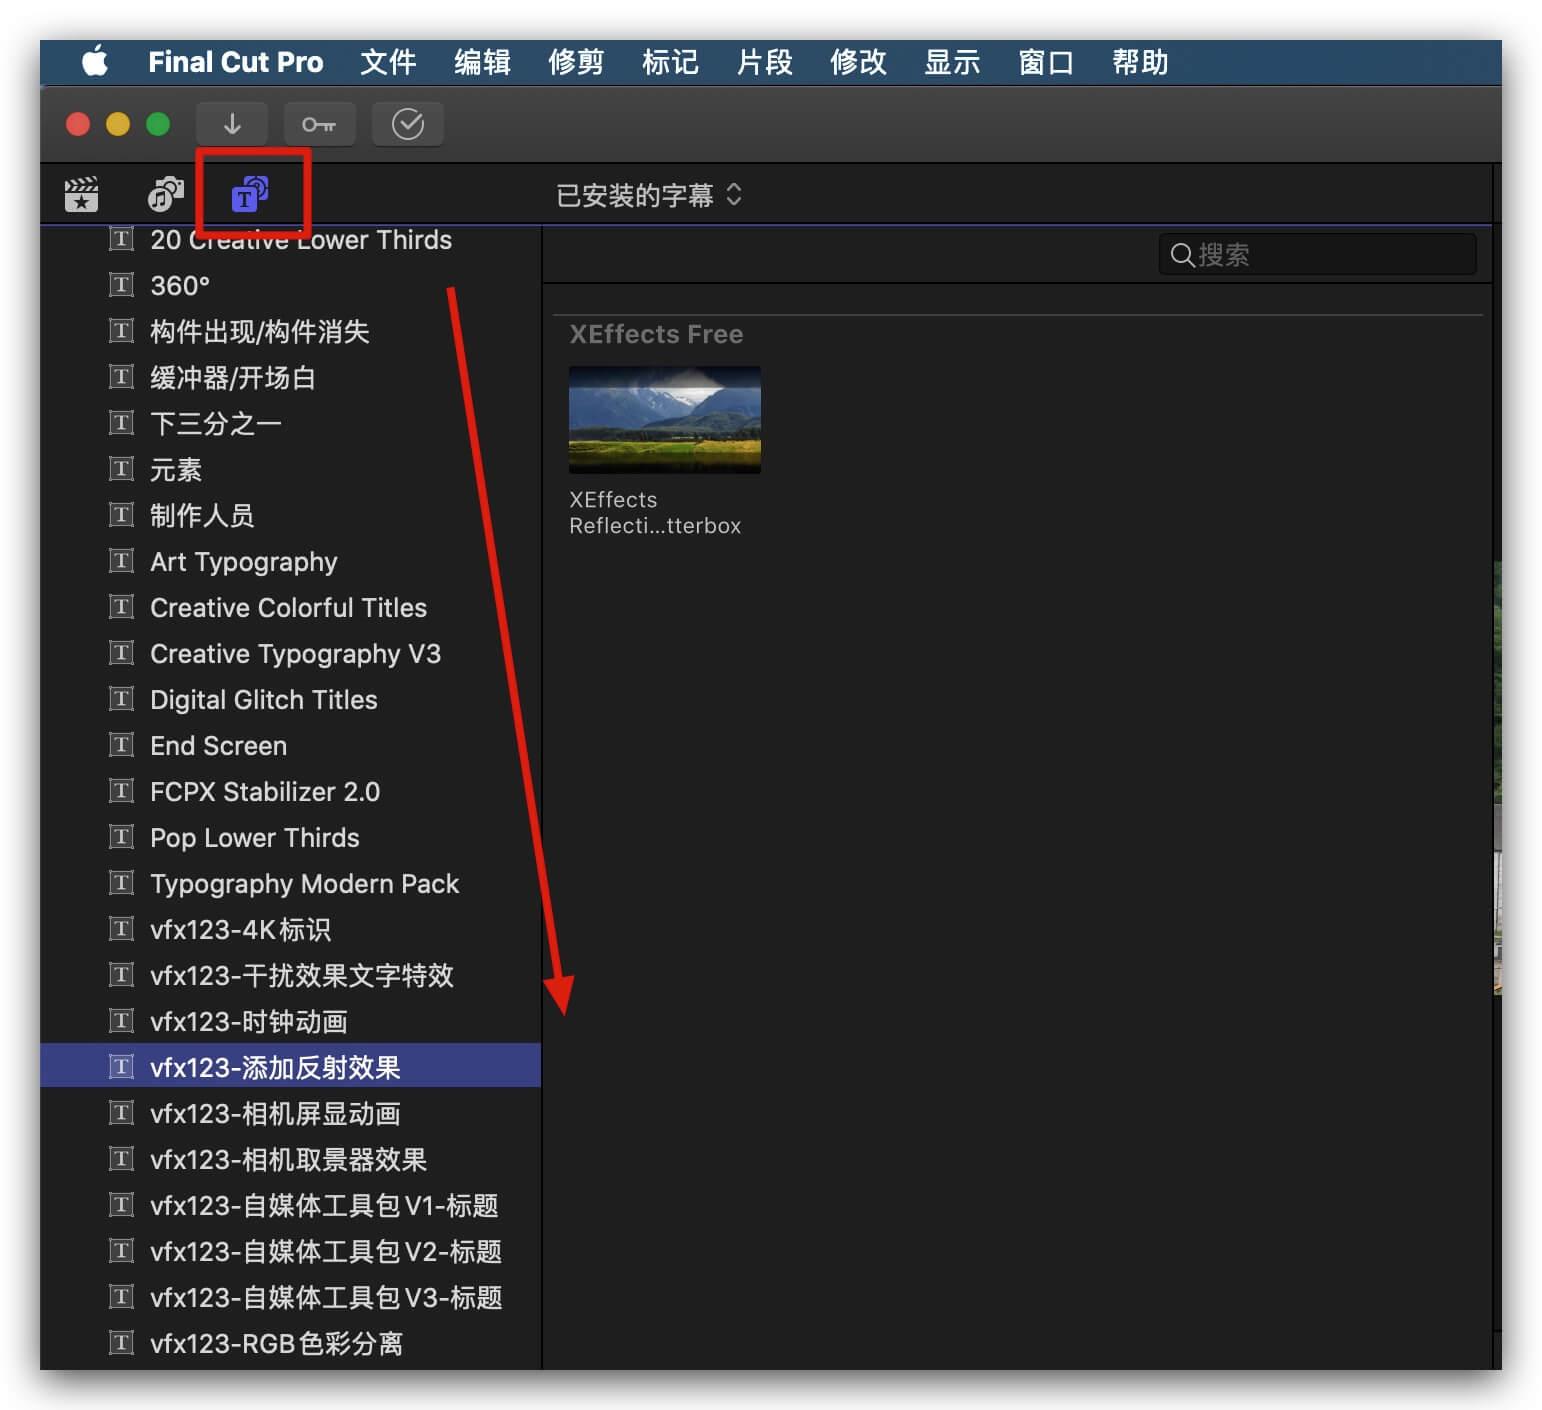 fcpx插件 影片添加反射效果模糊背景工具 Reflecting Letterbox